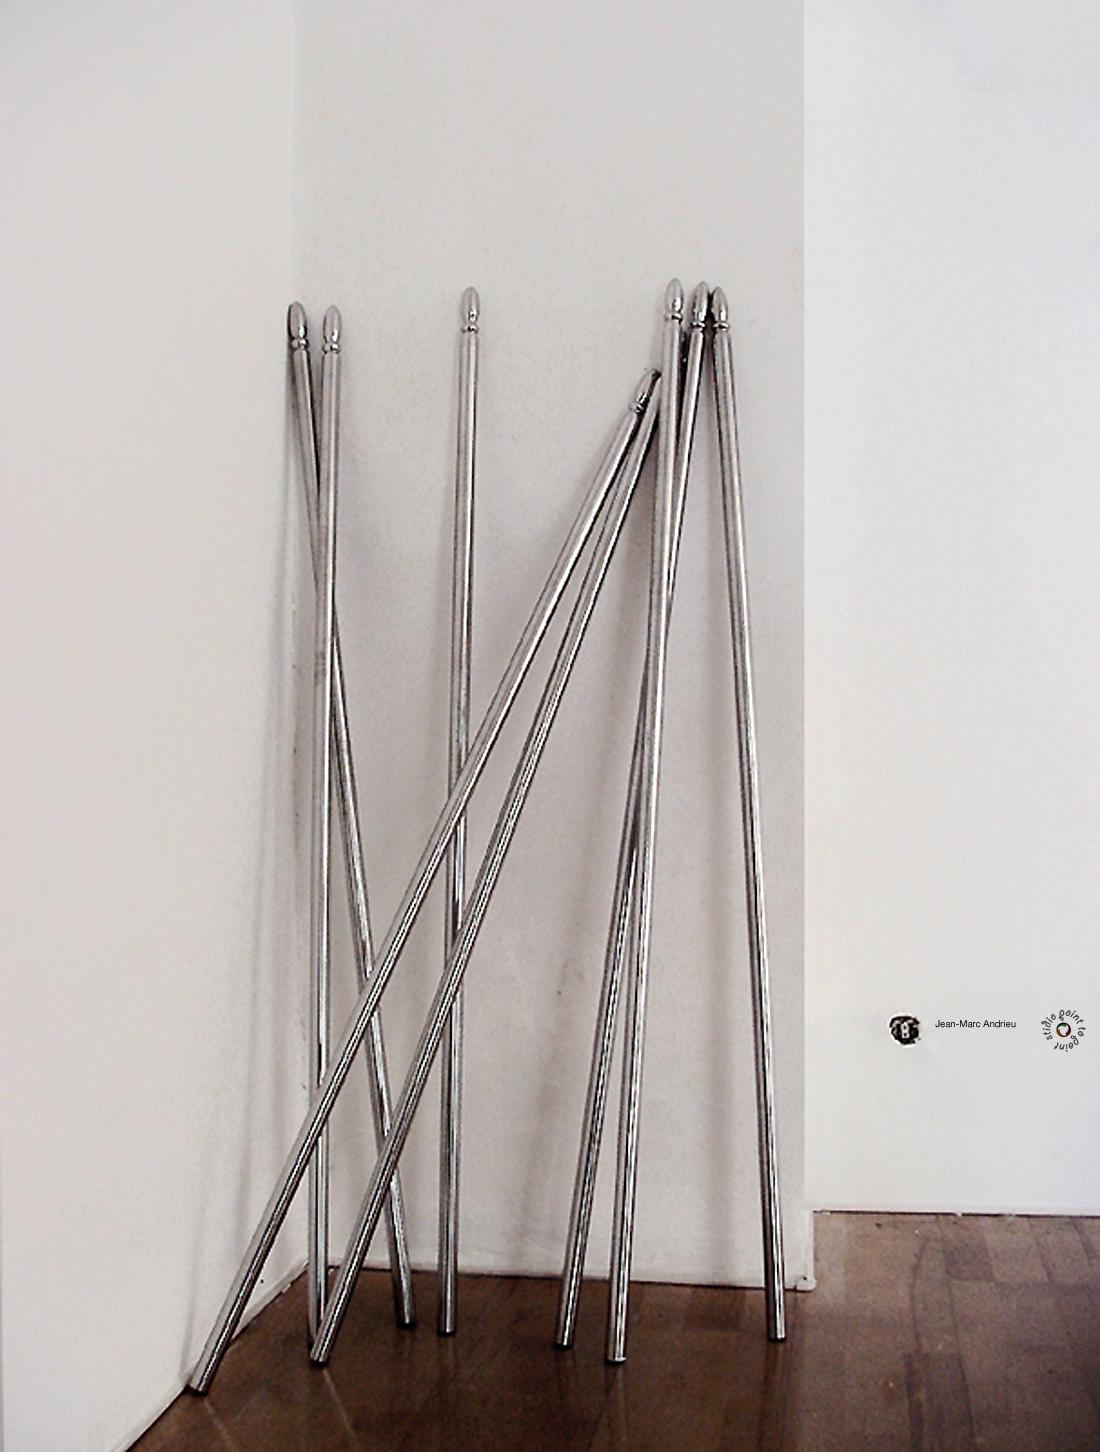 Jean-Marc-Andrieu-Art-Contemporain-Point-to-Point-Studio.jpg